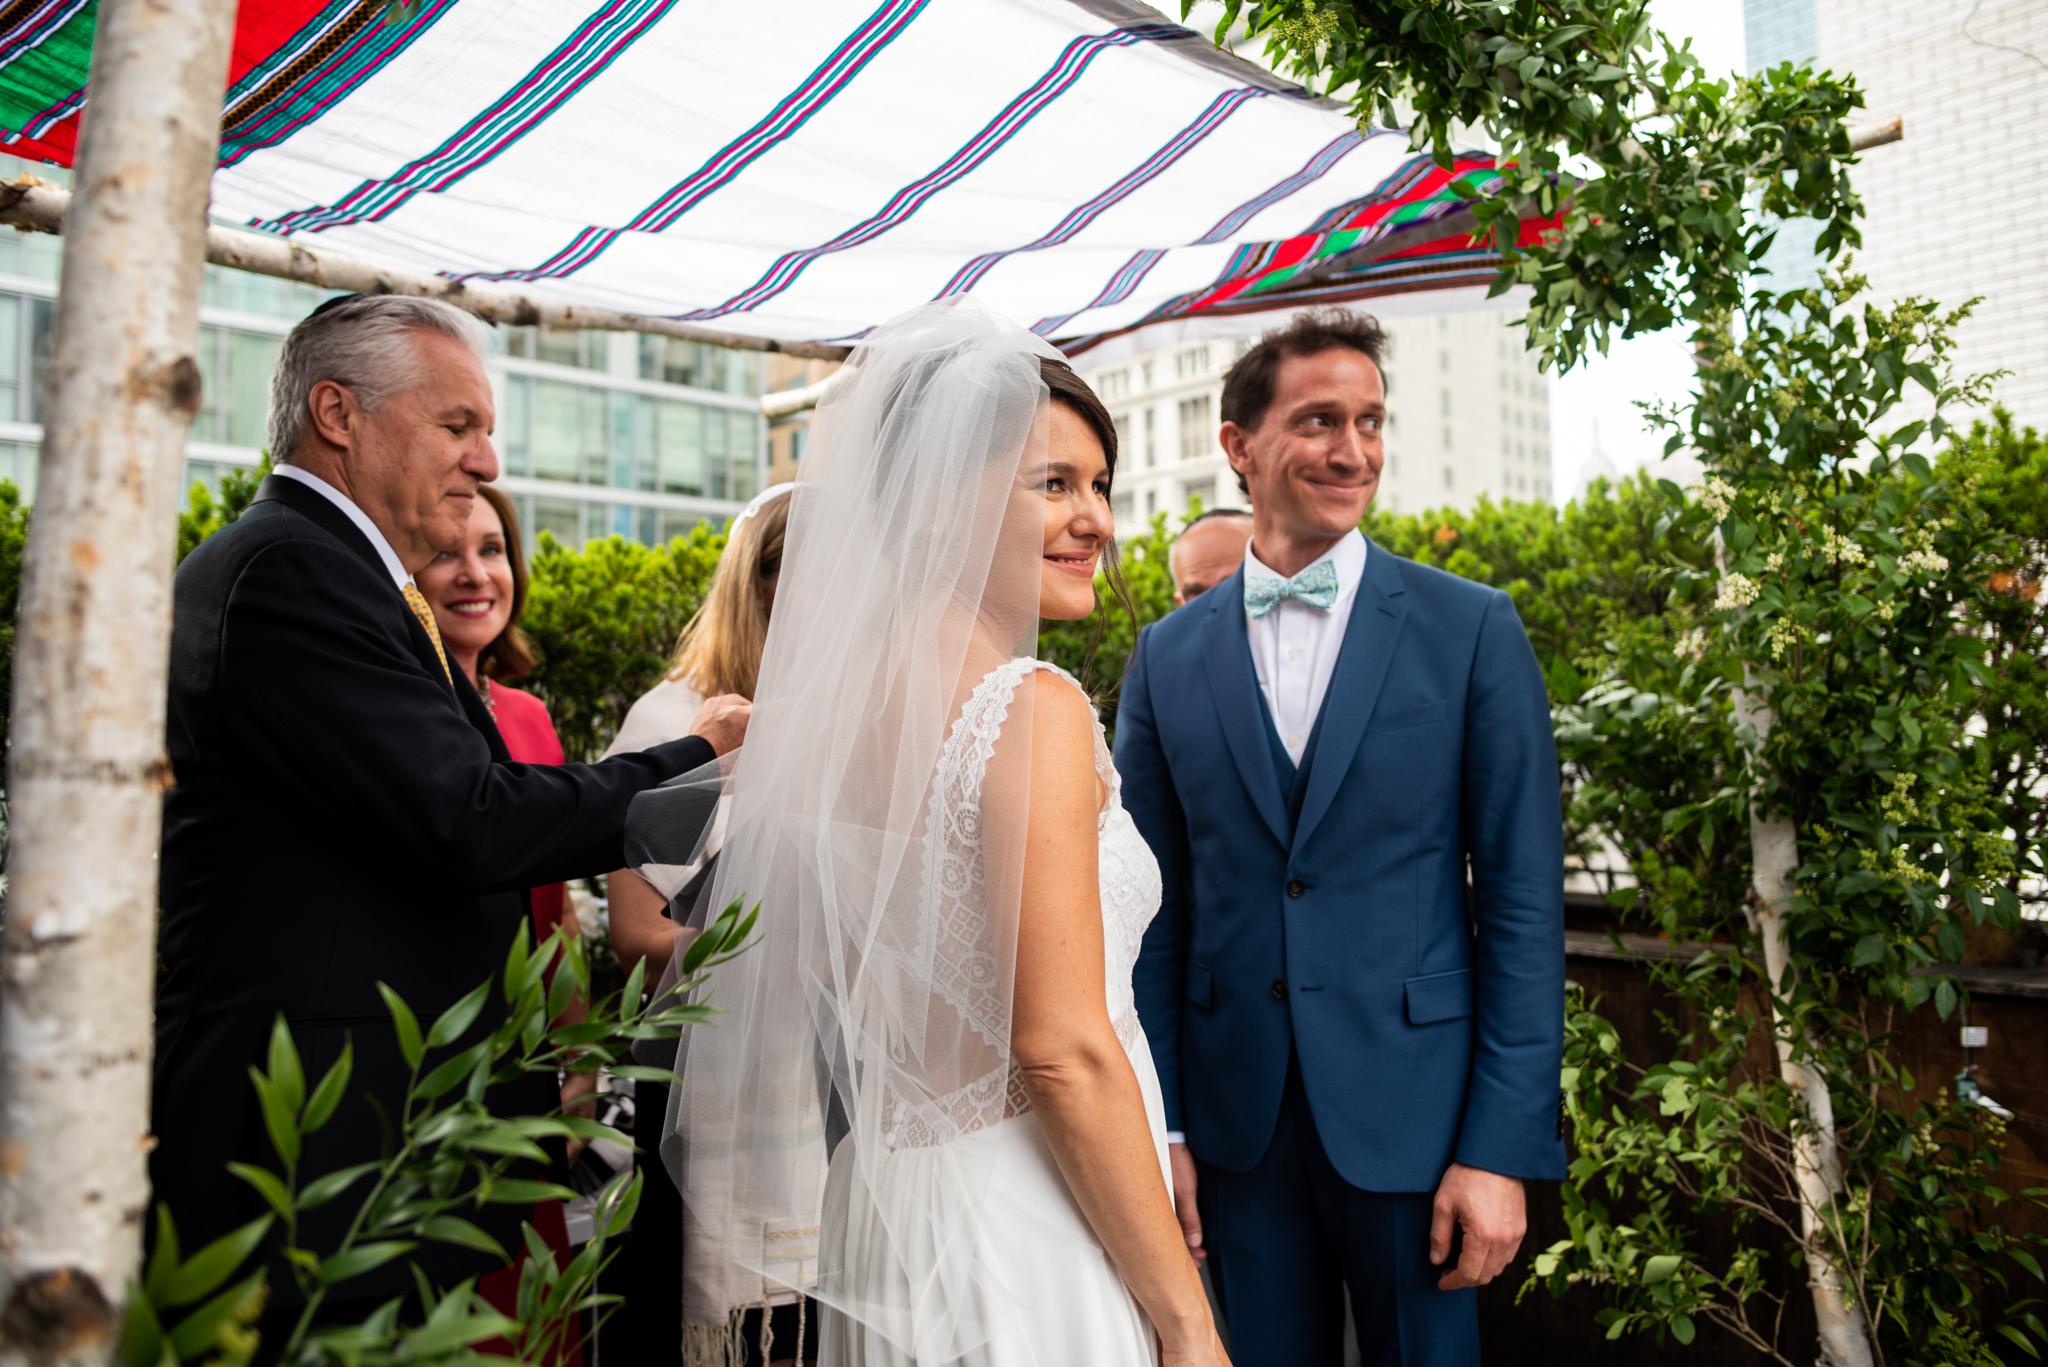 Keren & Jonathan's Wedding by Romina Hendlin @TheOtherRomina-012.jpg